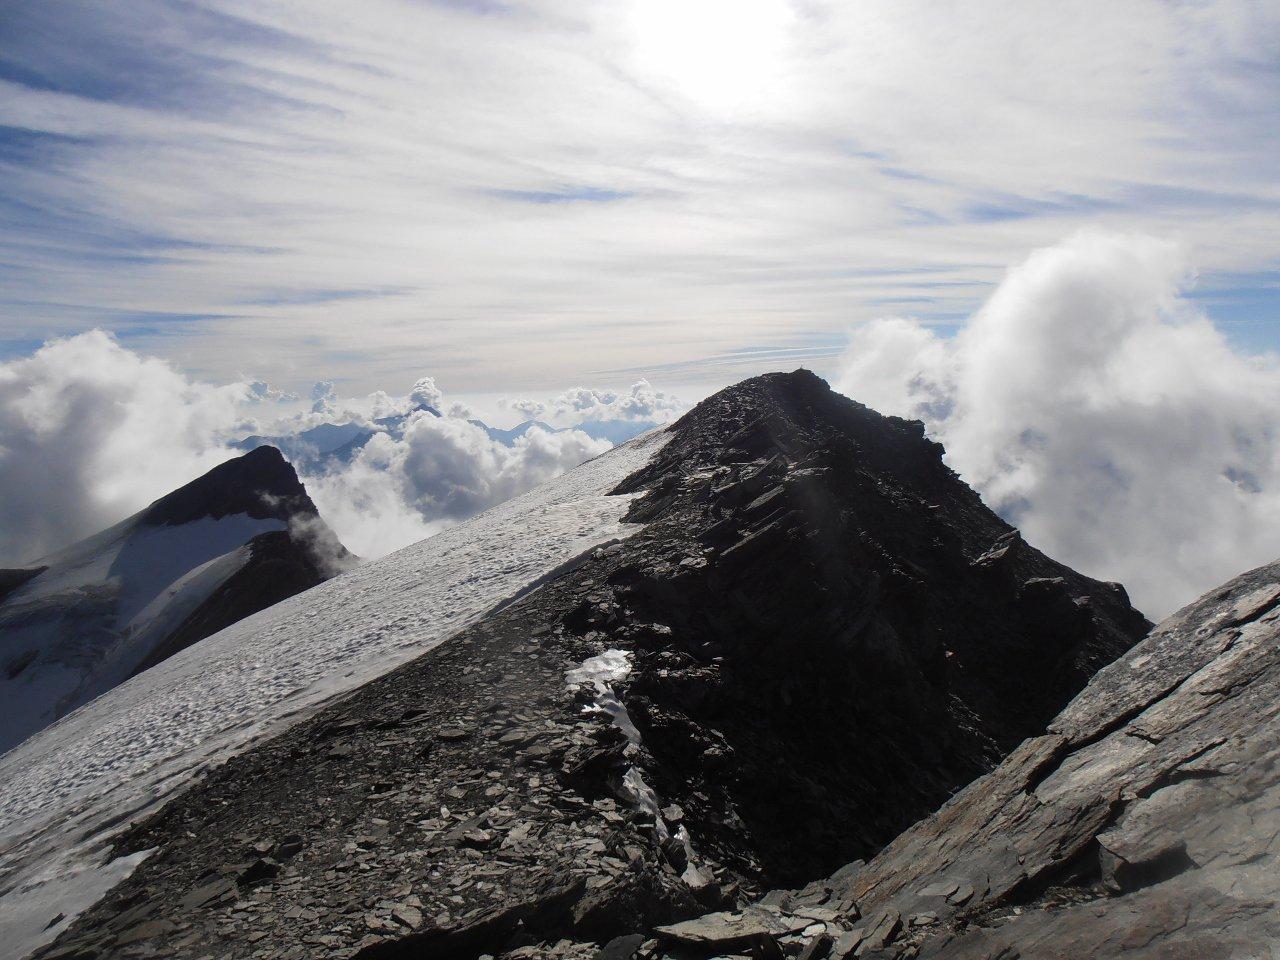 01 - Punta Rossa e Punta Nera viste dalla cresta che porta alla punta Bianca